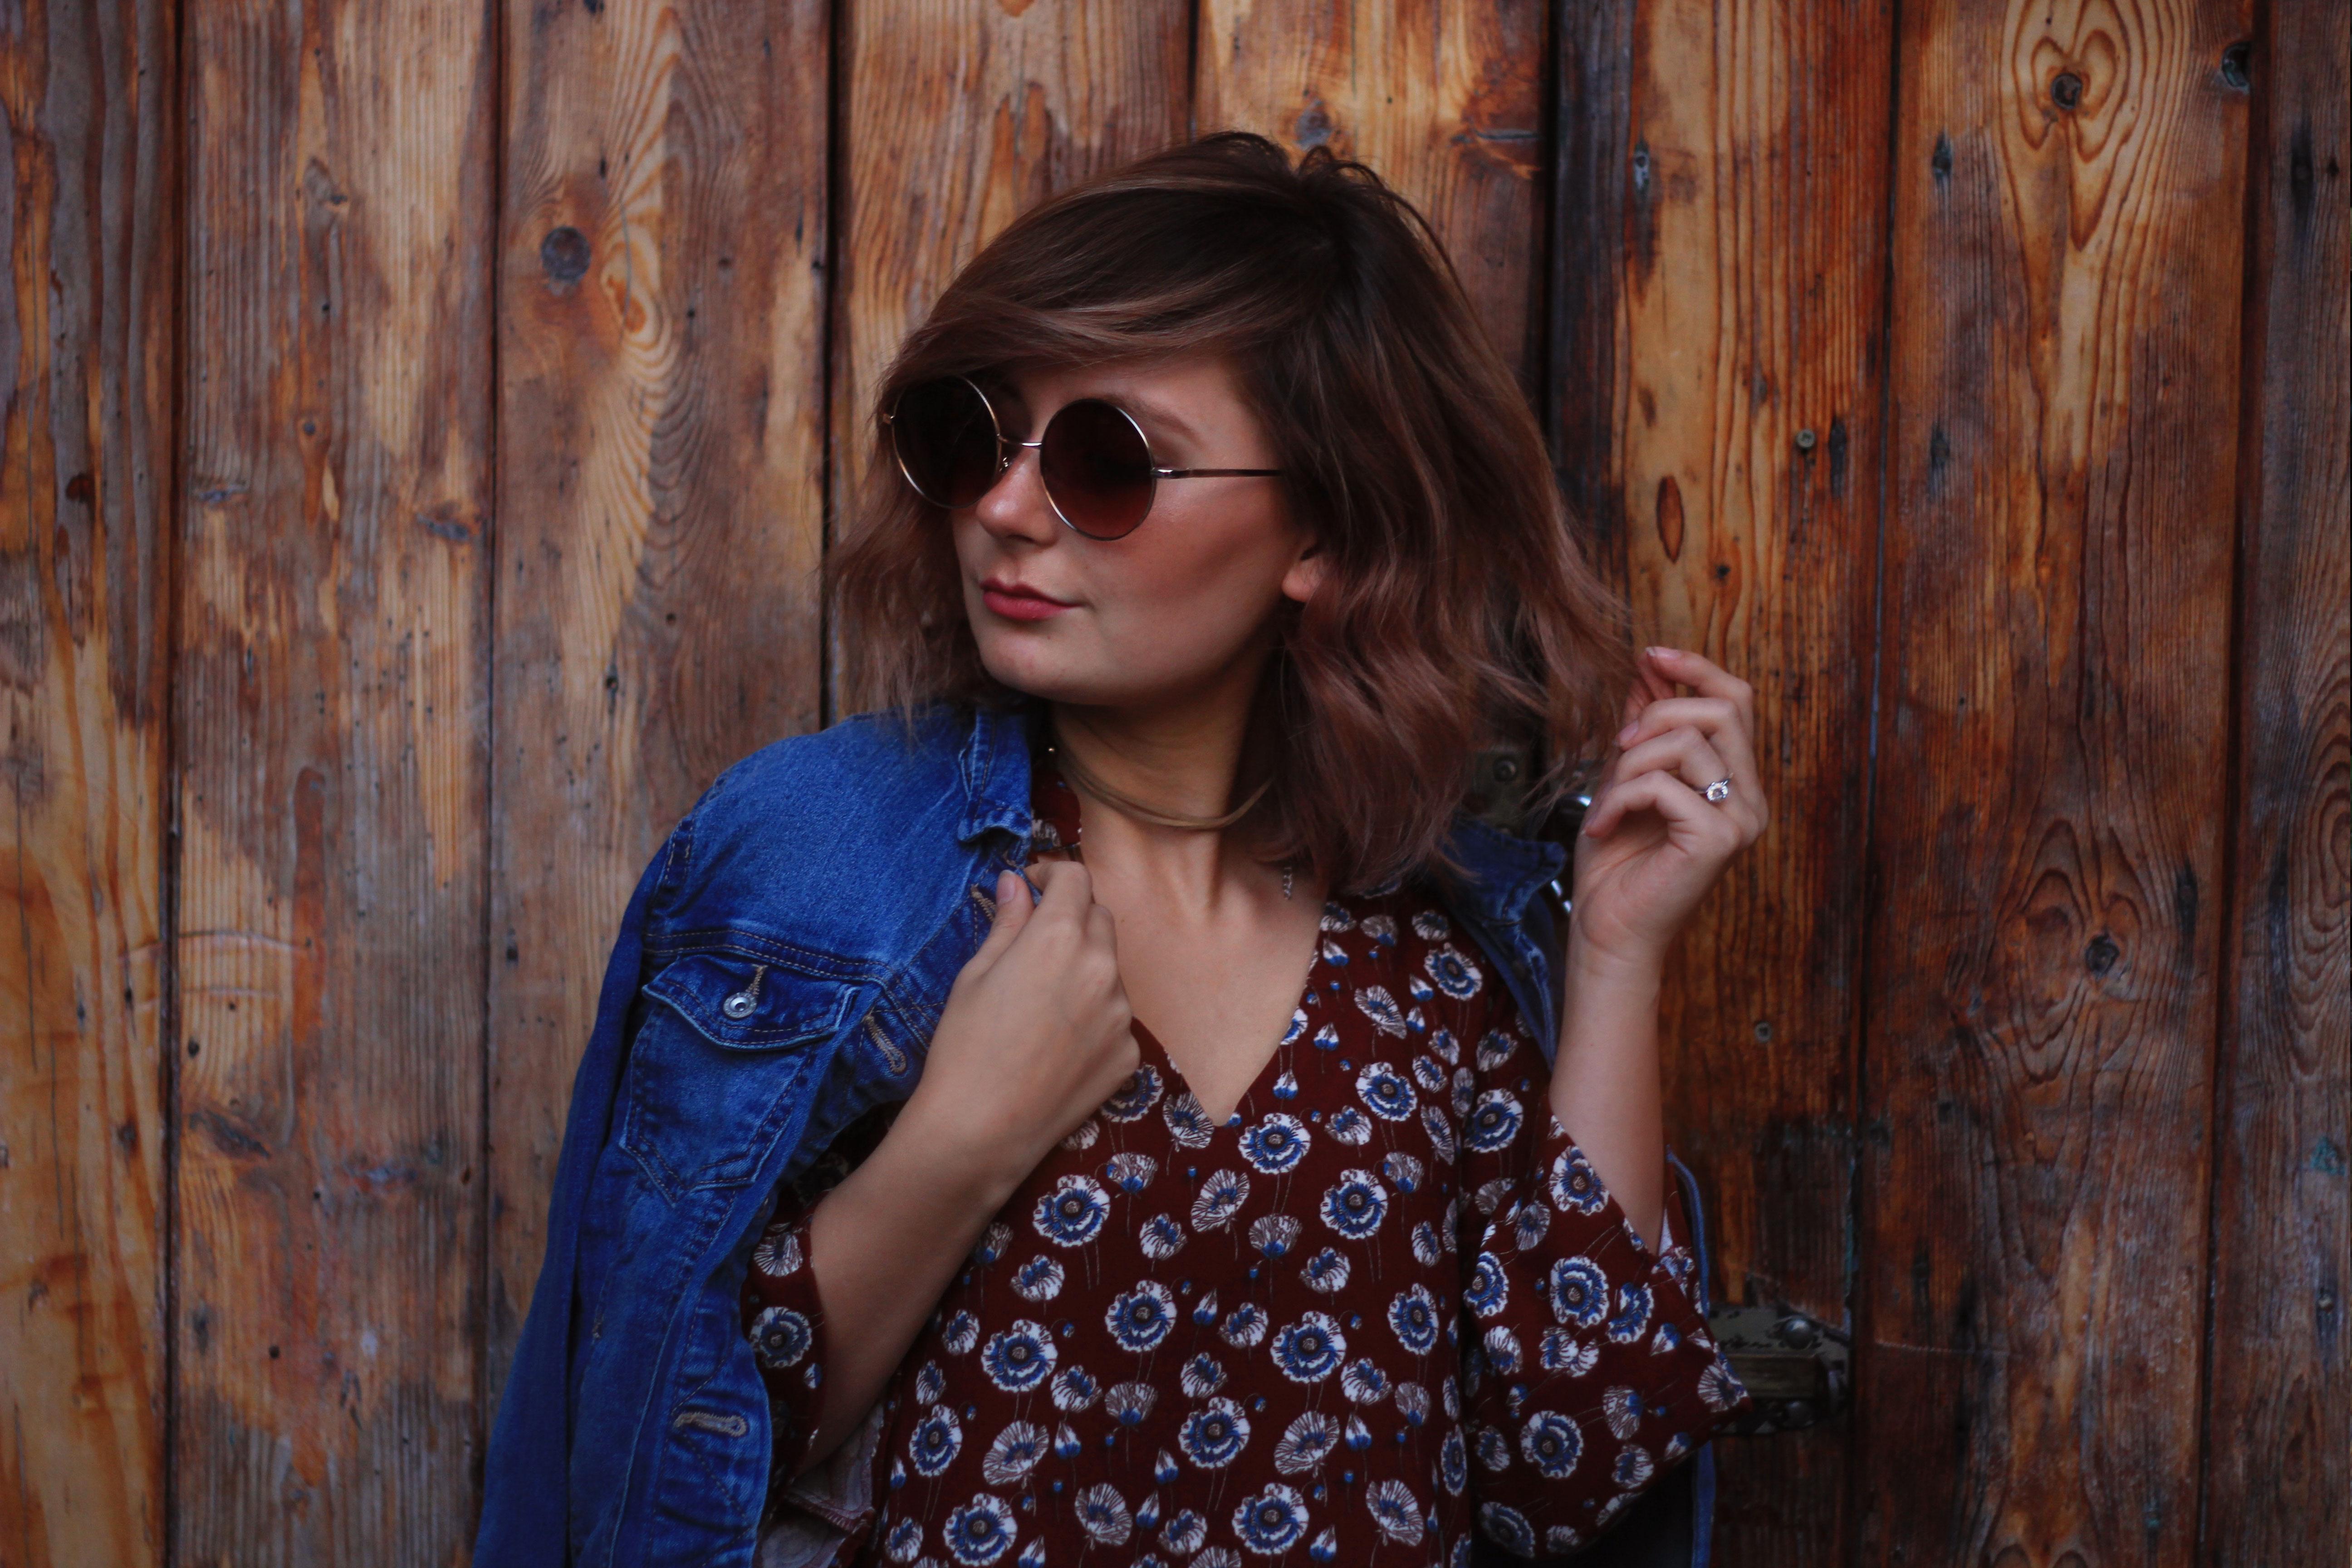 modeblogger, longbob, runde sonnenbrille, fashionblogger, modeblogger, mannheim, retro, boho, bohemian